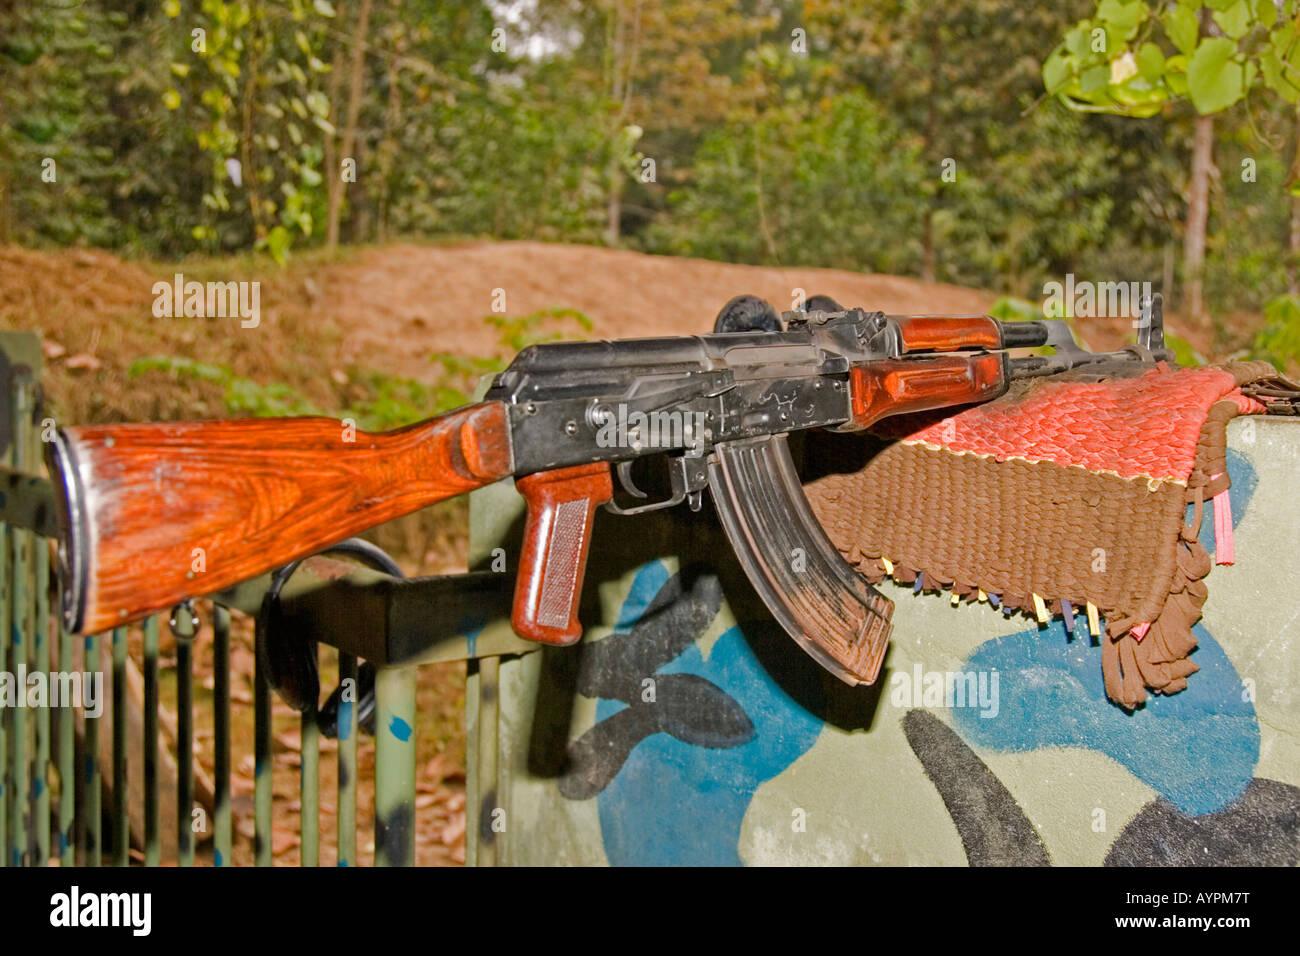 Ak 47 Stock Photos & Ak 47 Stock Images - Alamy